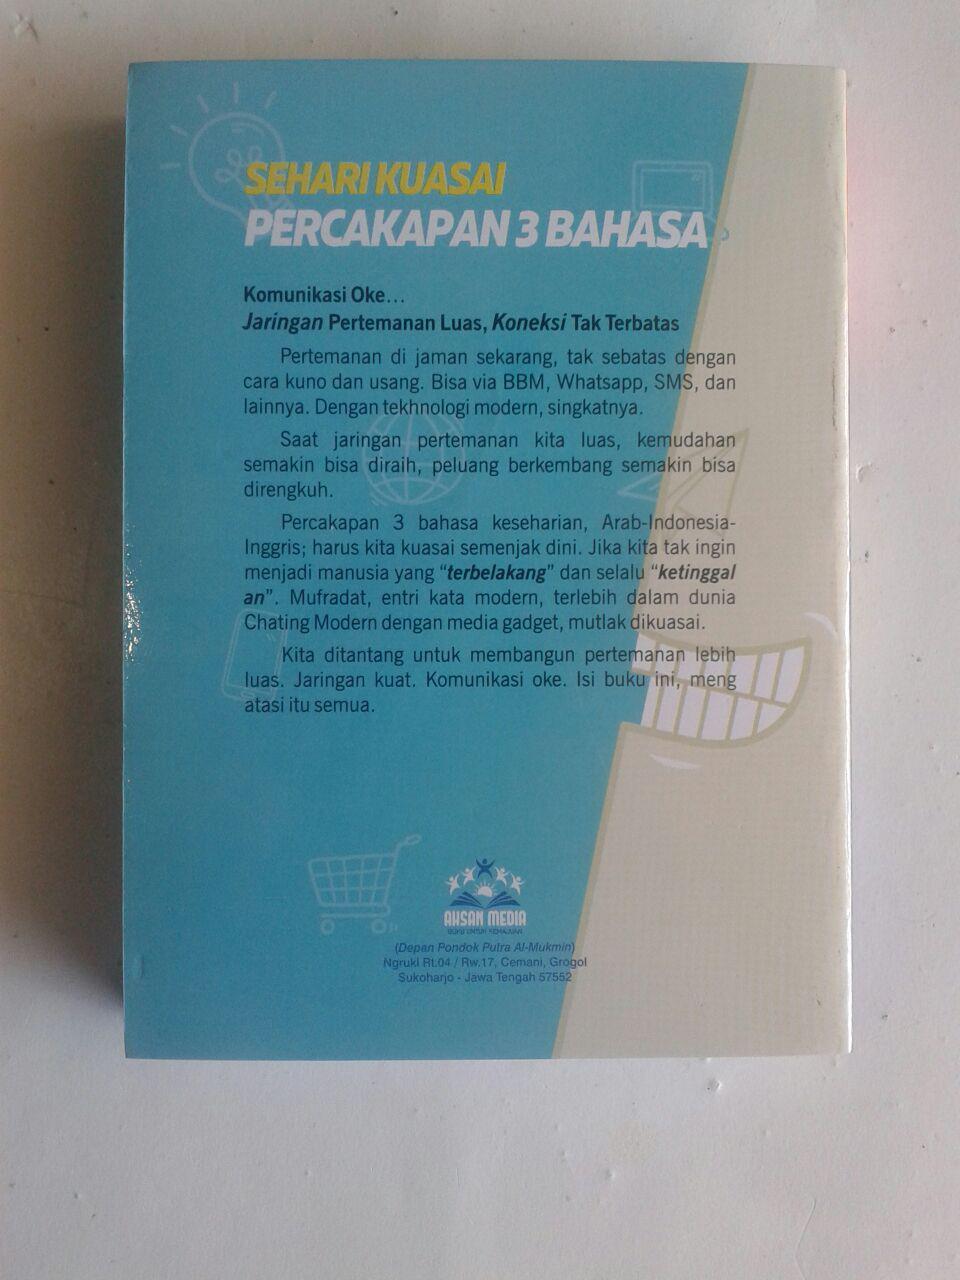 Buku Sehari Kuasai Percakapan 3 Bahasa Simpel Praktis Cepat cover